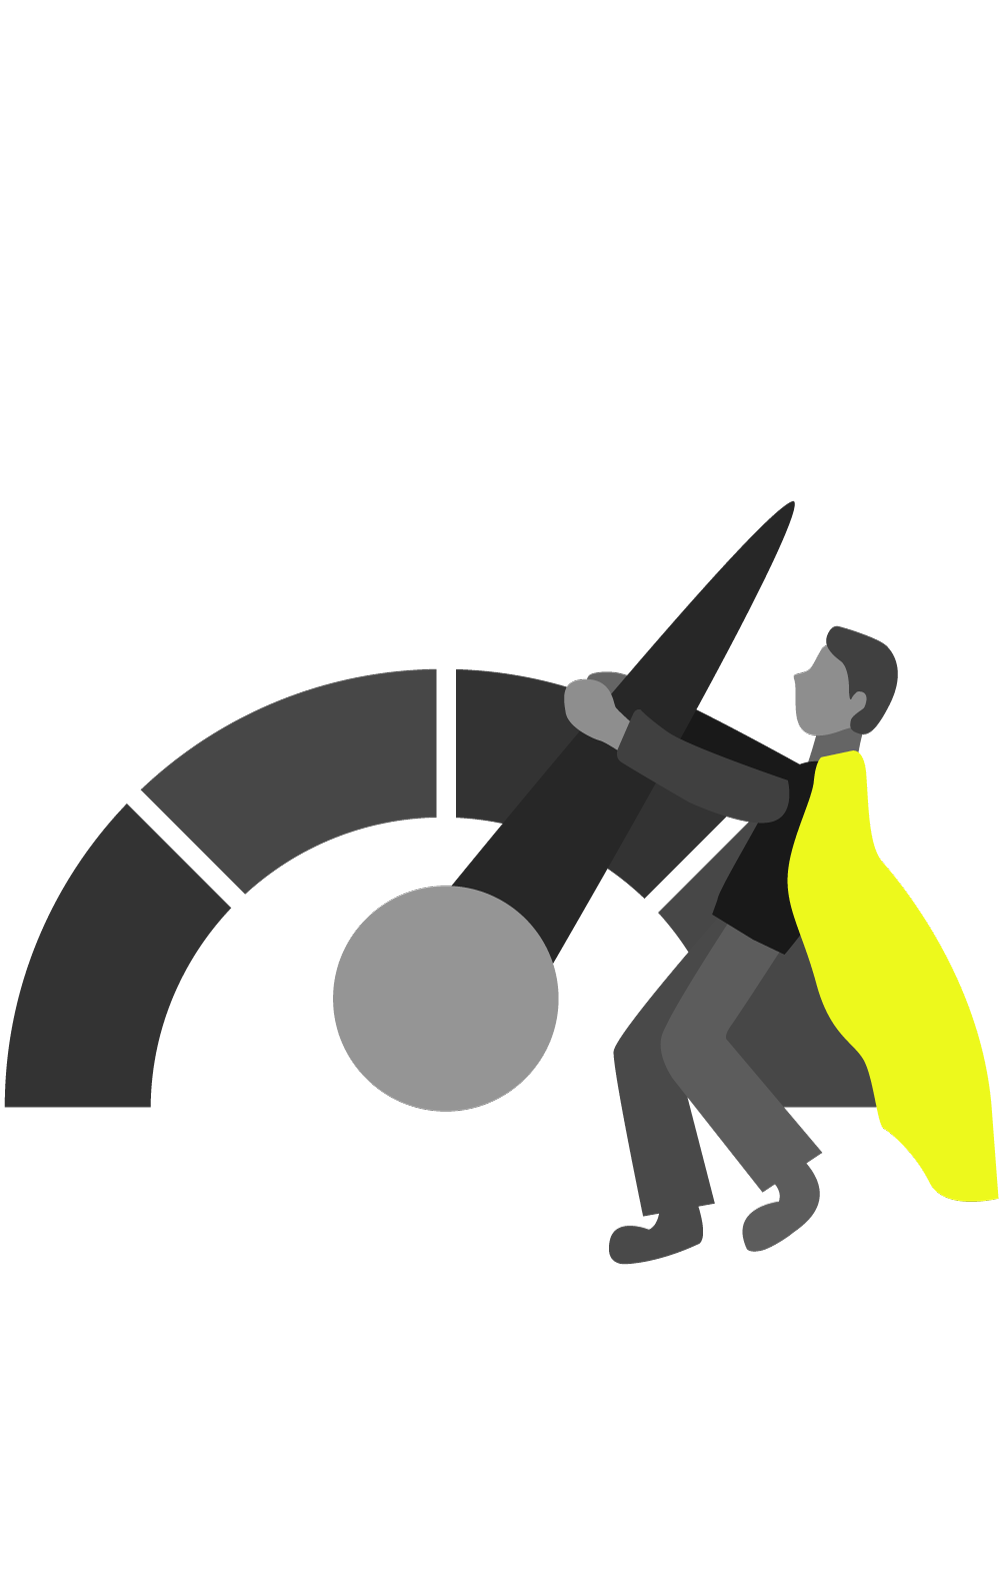 Illustration Performance Check